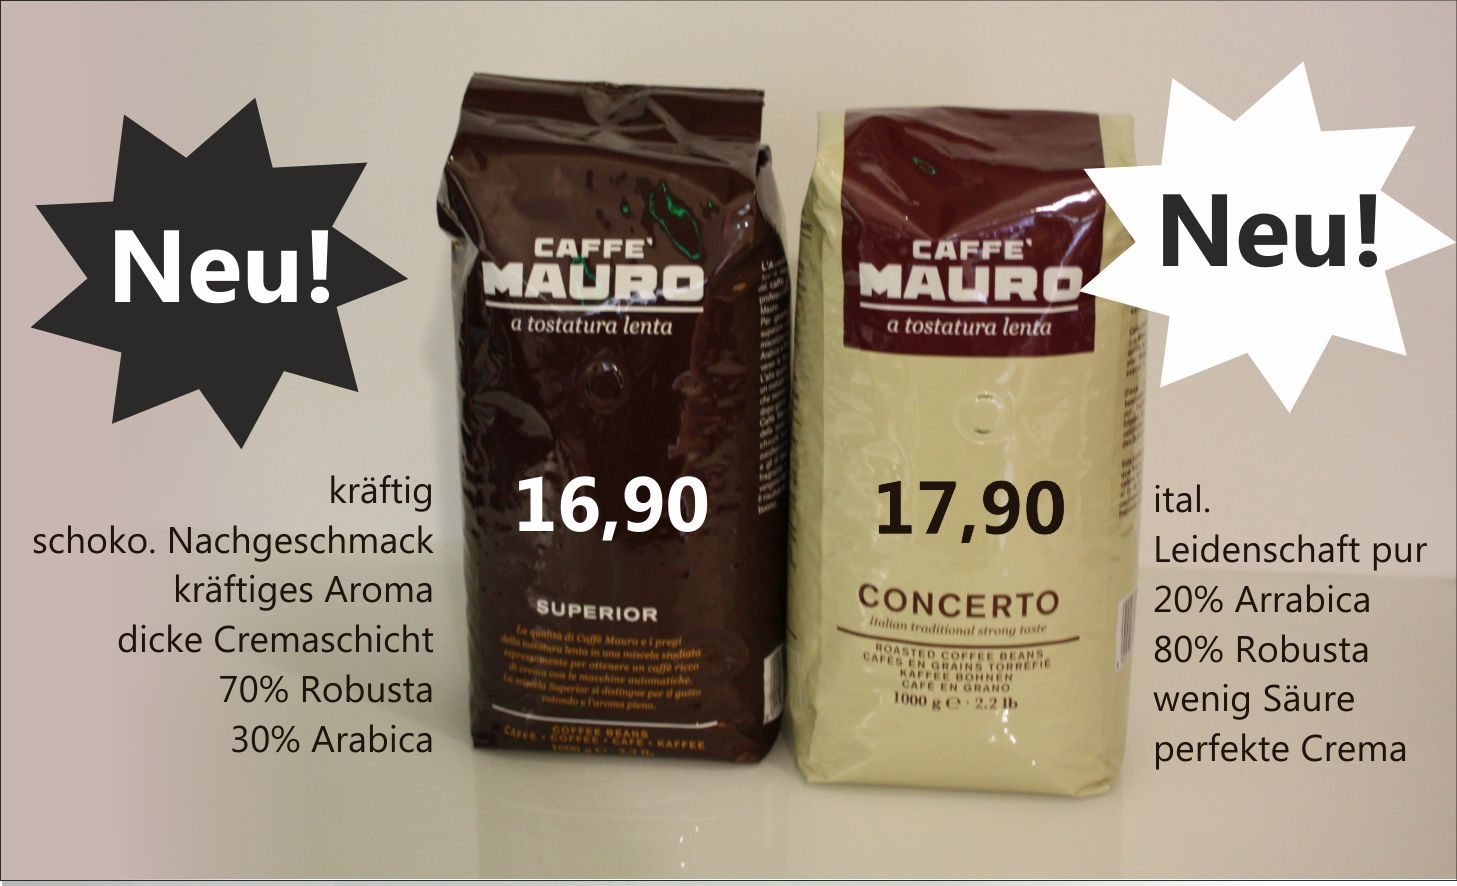 Kaffee Mauro Concerto